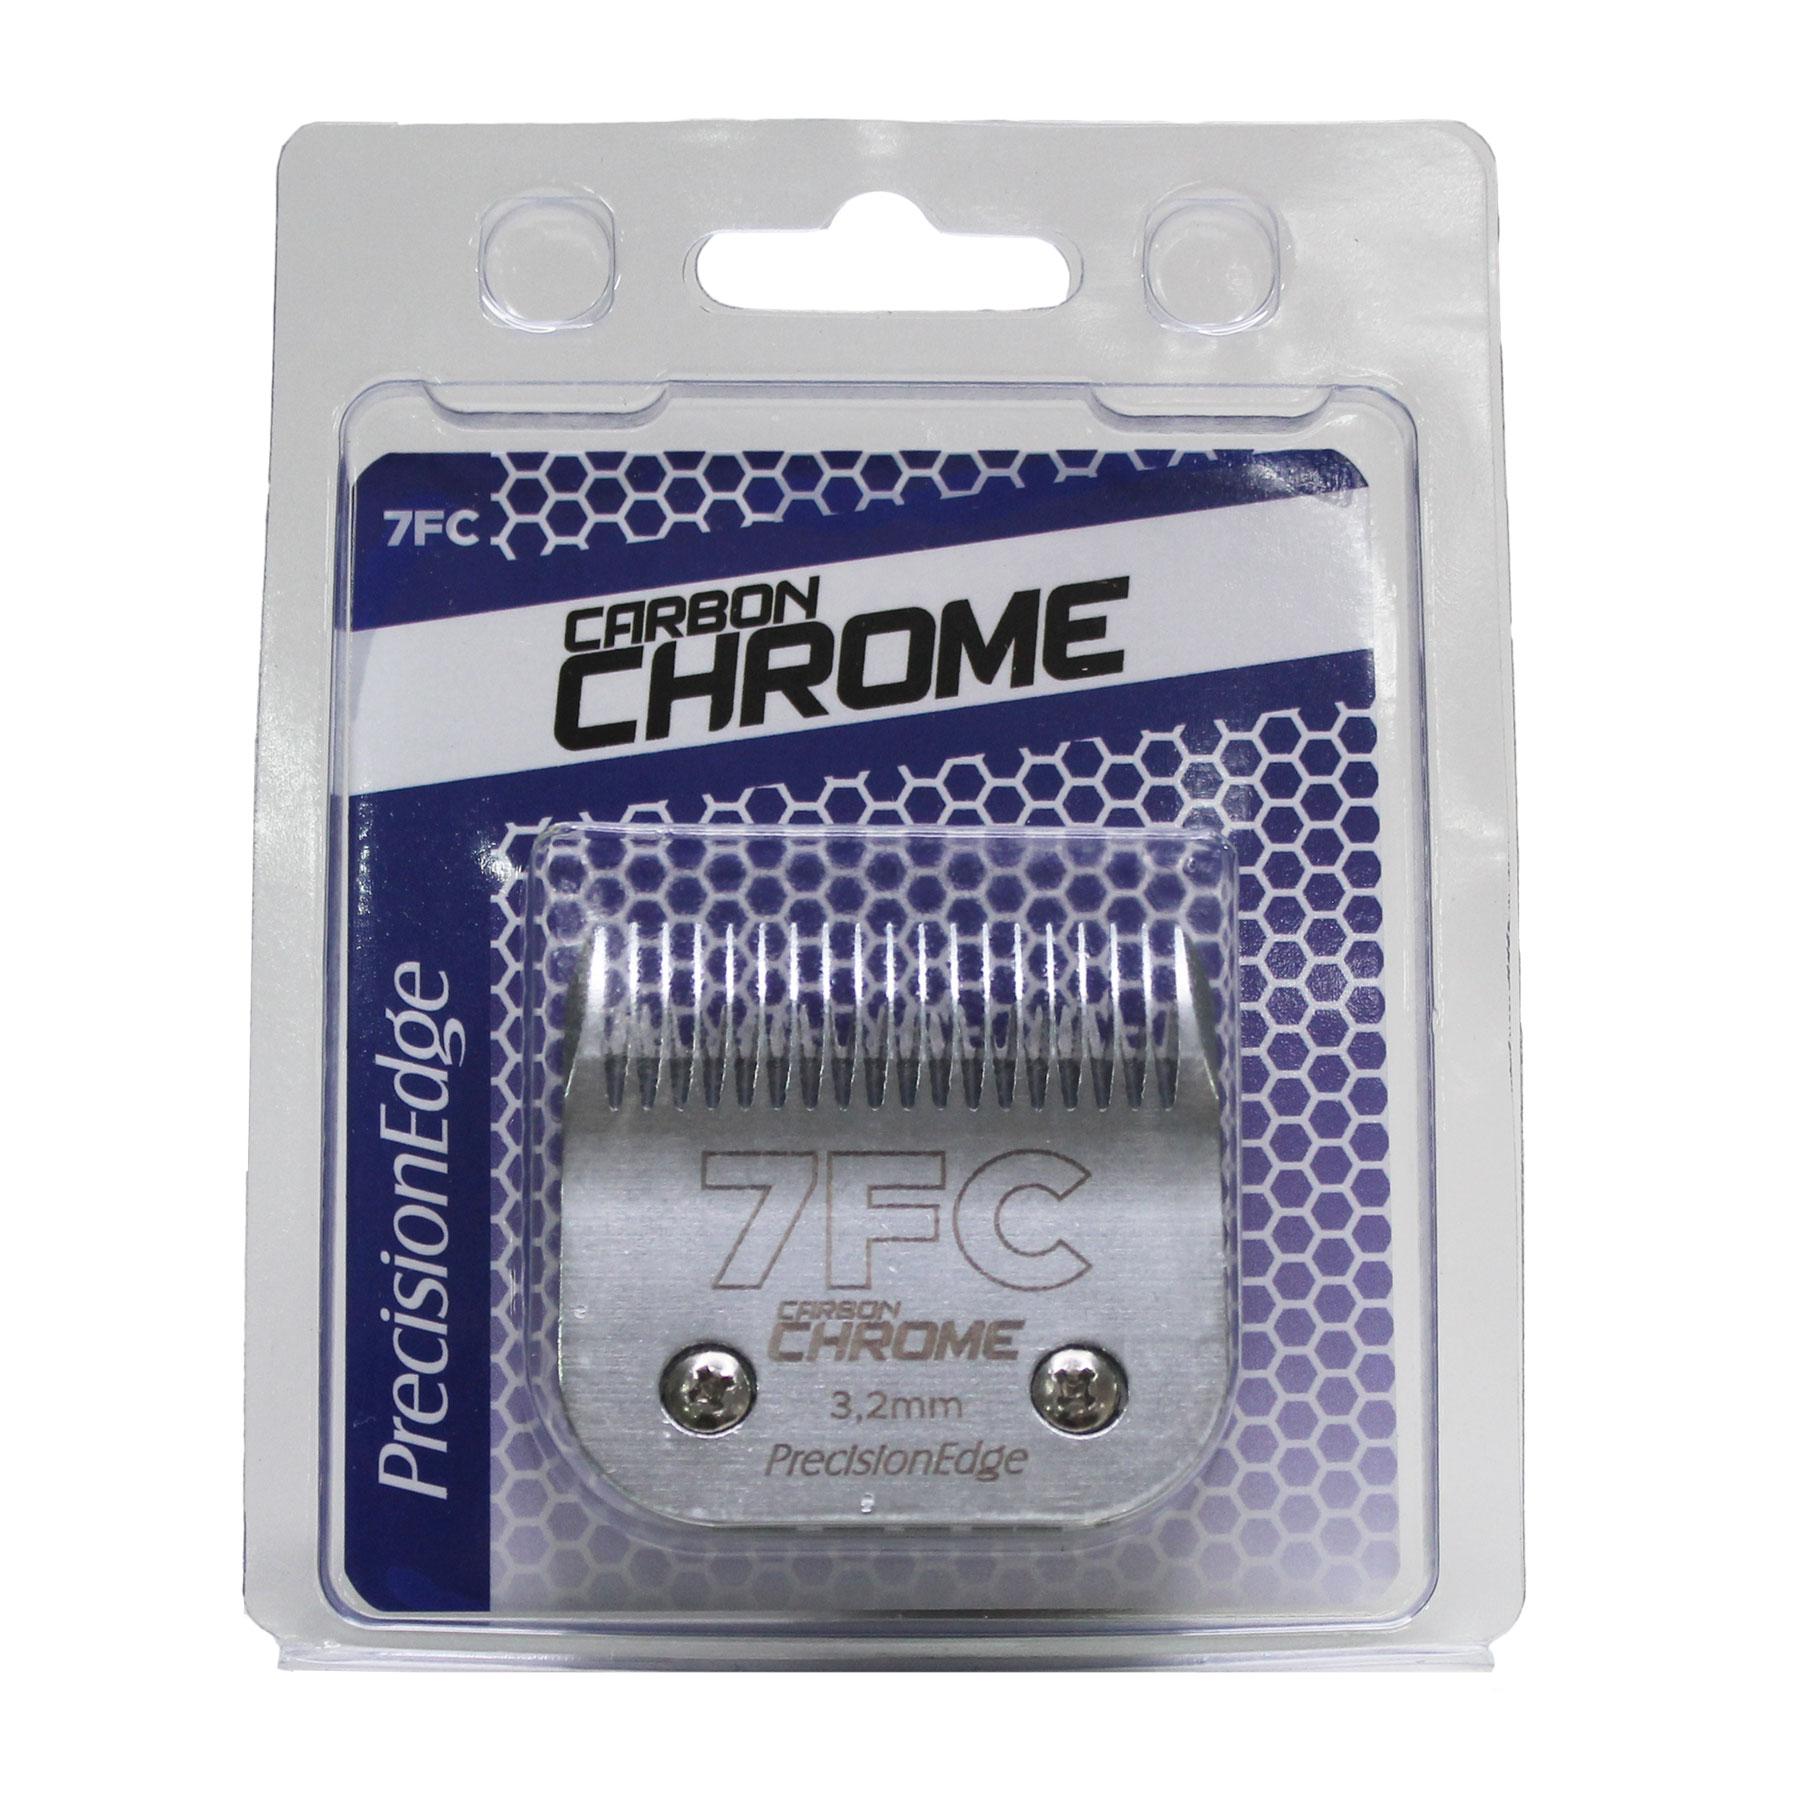 Lâmina Precision Edge Carbon Chrome 7FC - 3,2mm